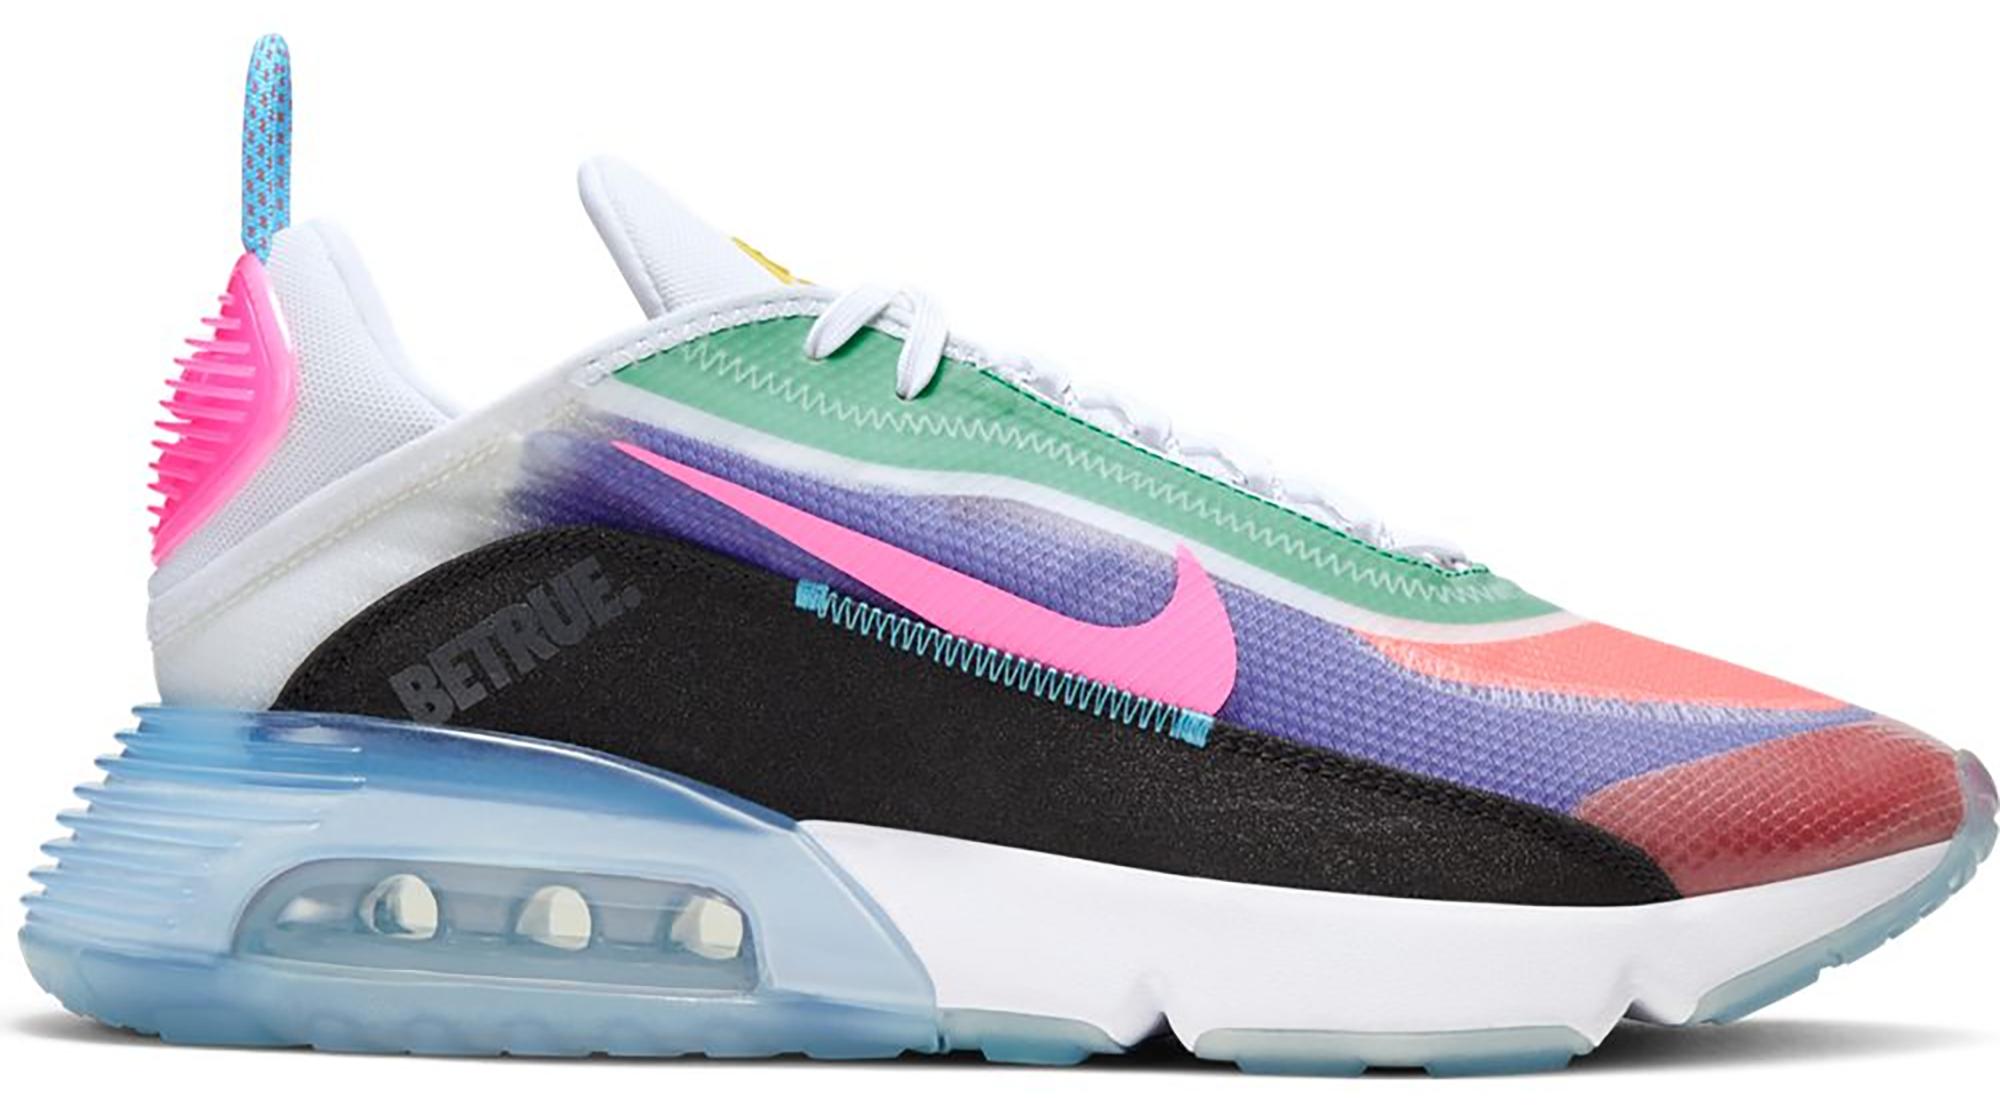 Nike Air Max 2090 Be True (2020